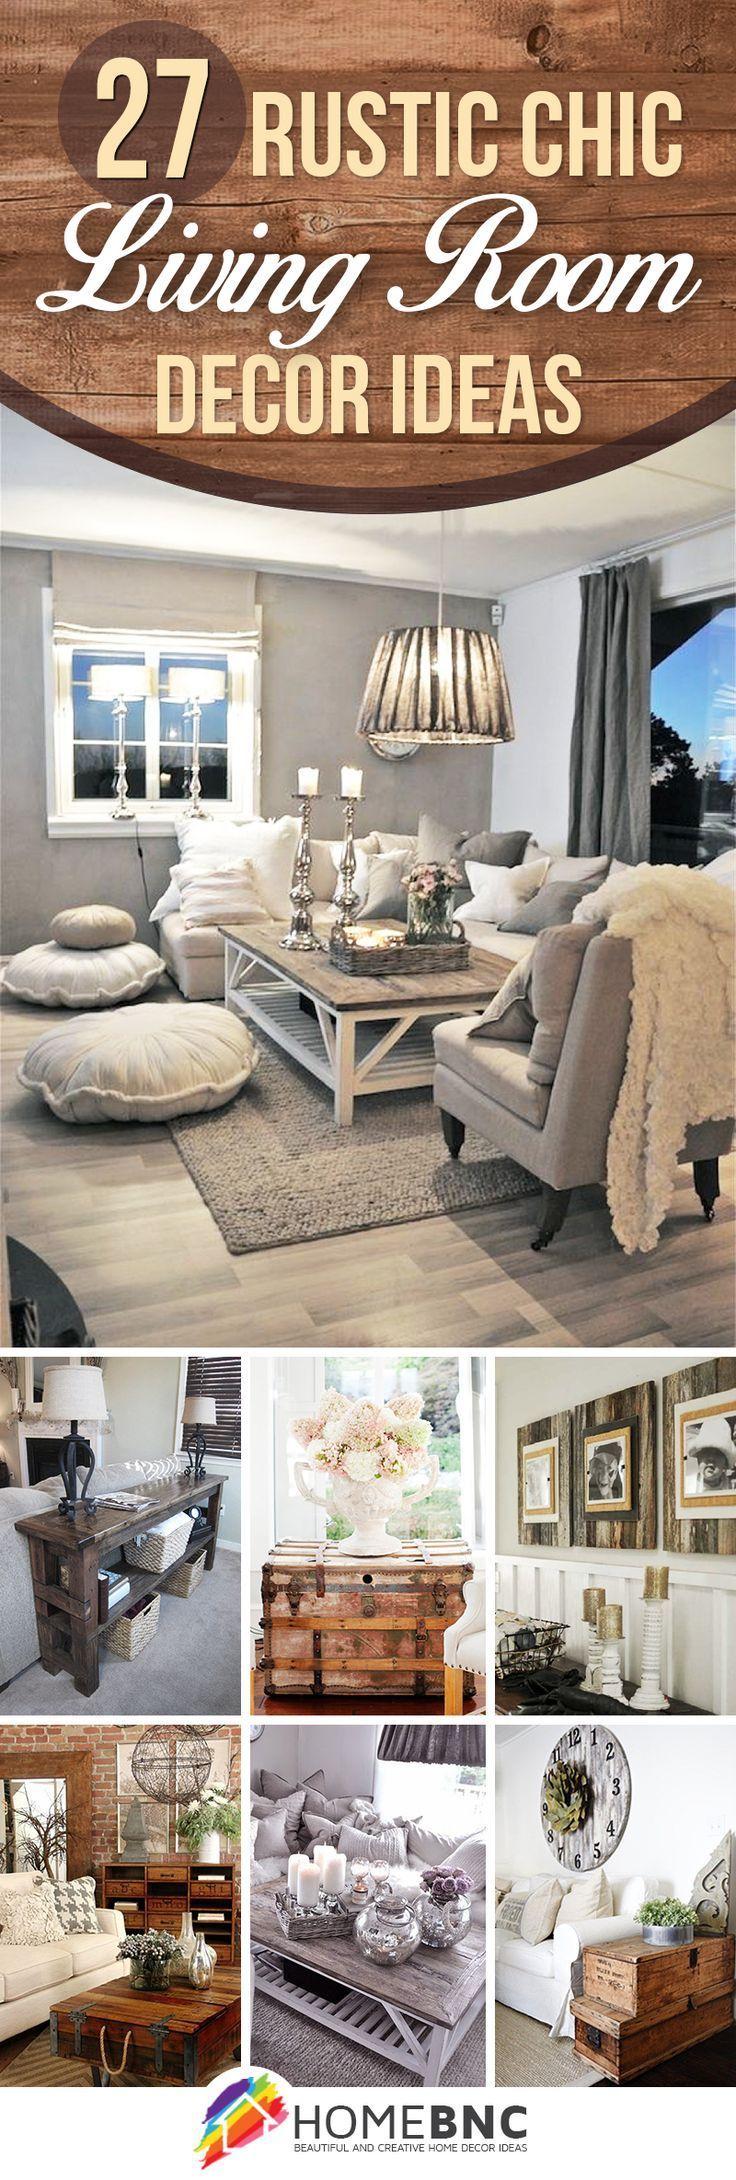 Rustic Chic Living Room Ideas Scheduled Via Http Www Tailwindapp Com Utm Source Pinter Farm House Living Room Rustic Chic Living Room Chic Living Room Decor